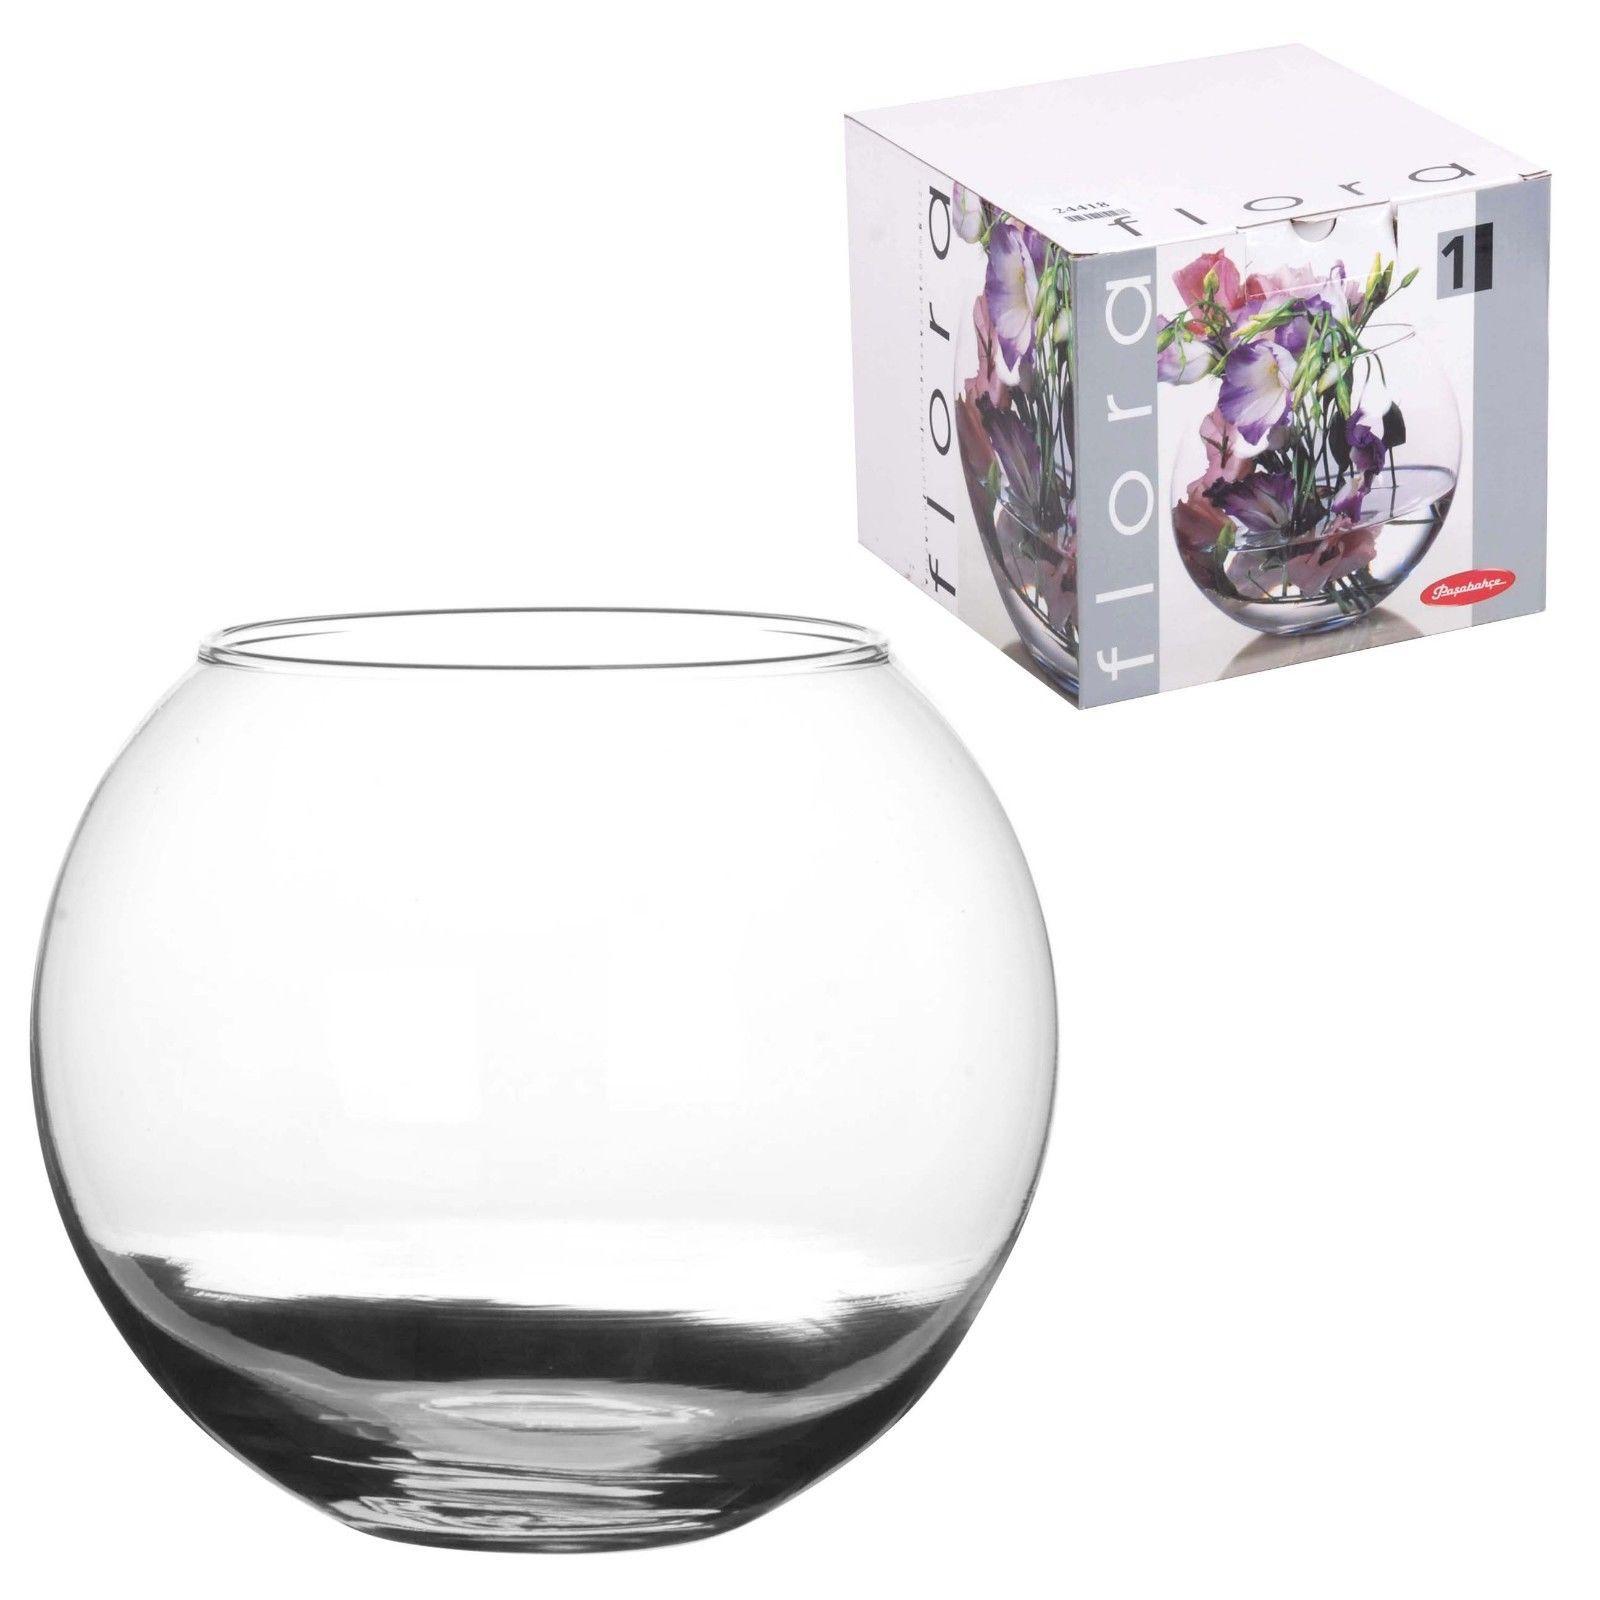 eastland cylinder vases of pasabahce botanica bowl 45068 ebay regarding norton secured powered by verisign